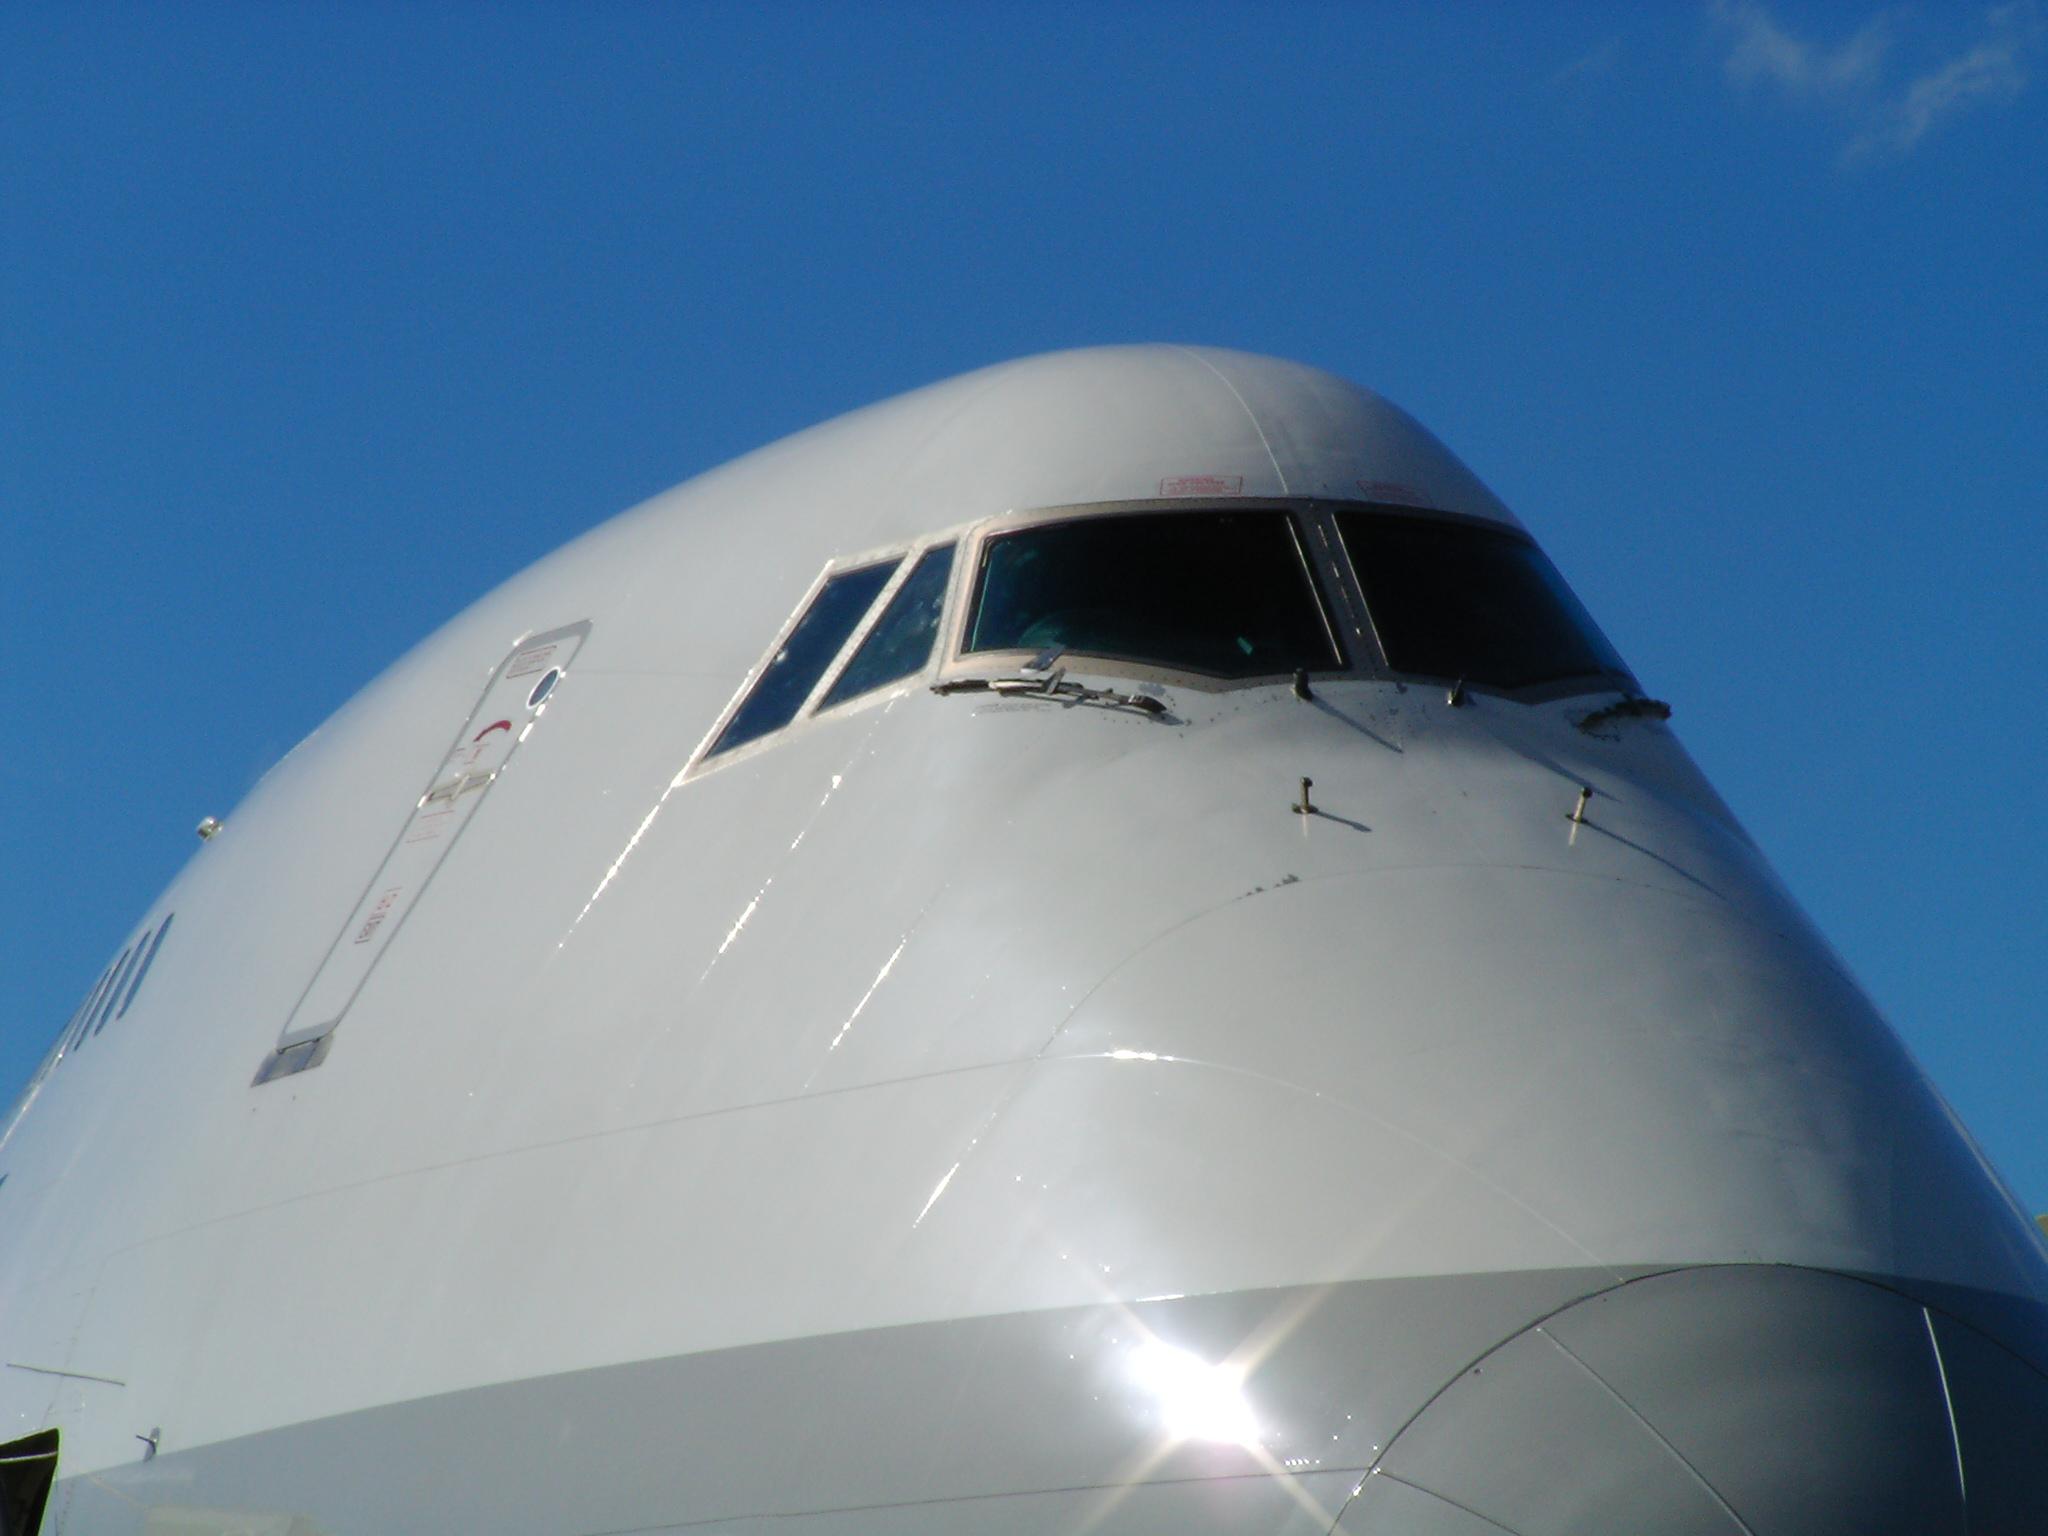 Bald Plane